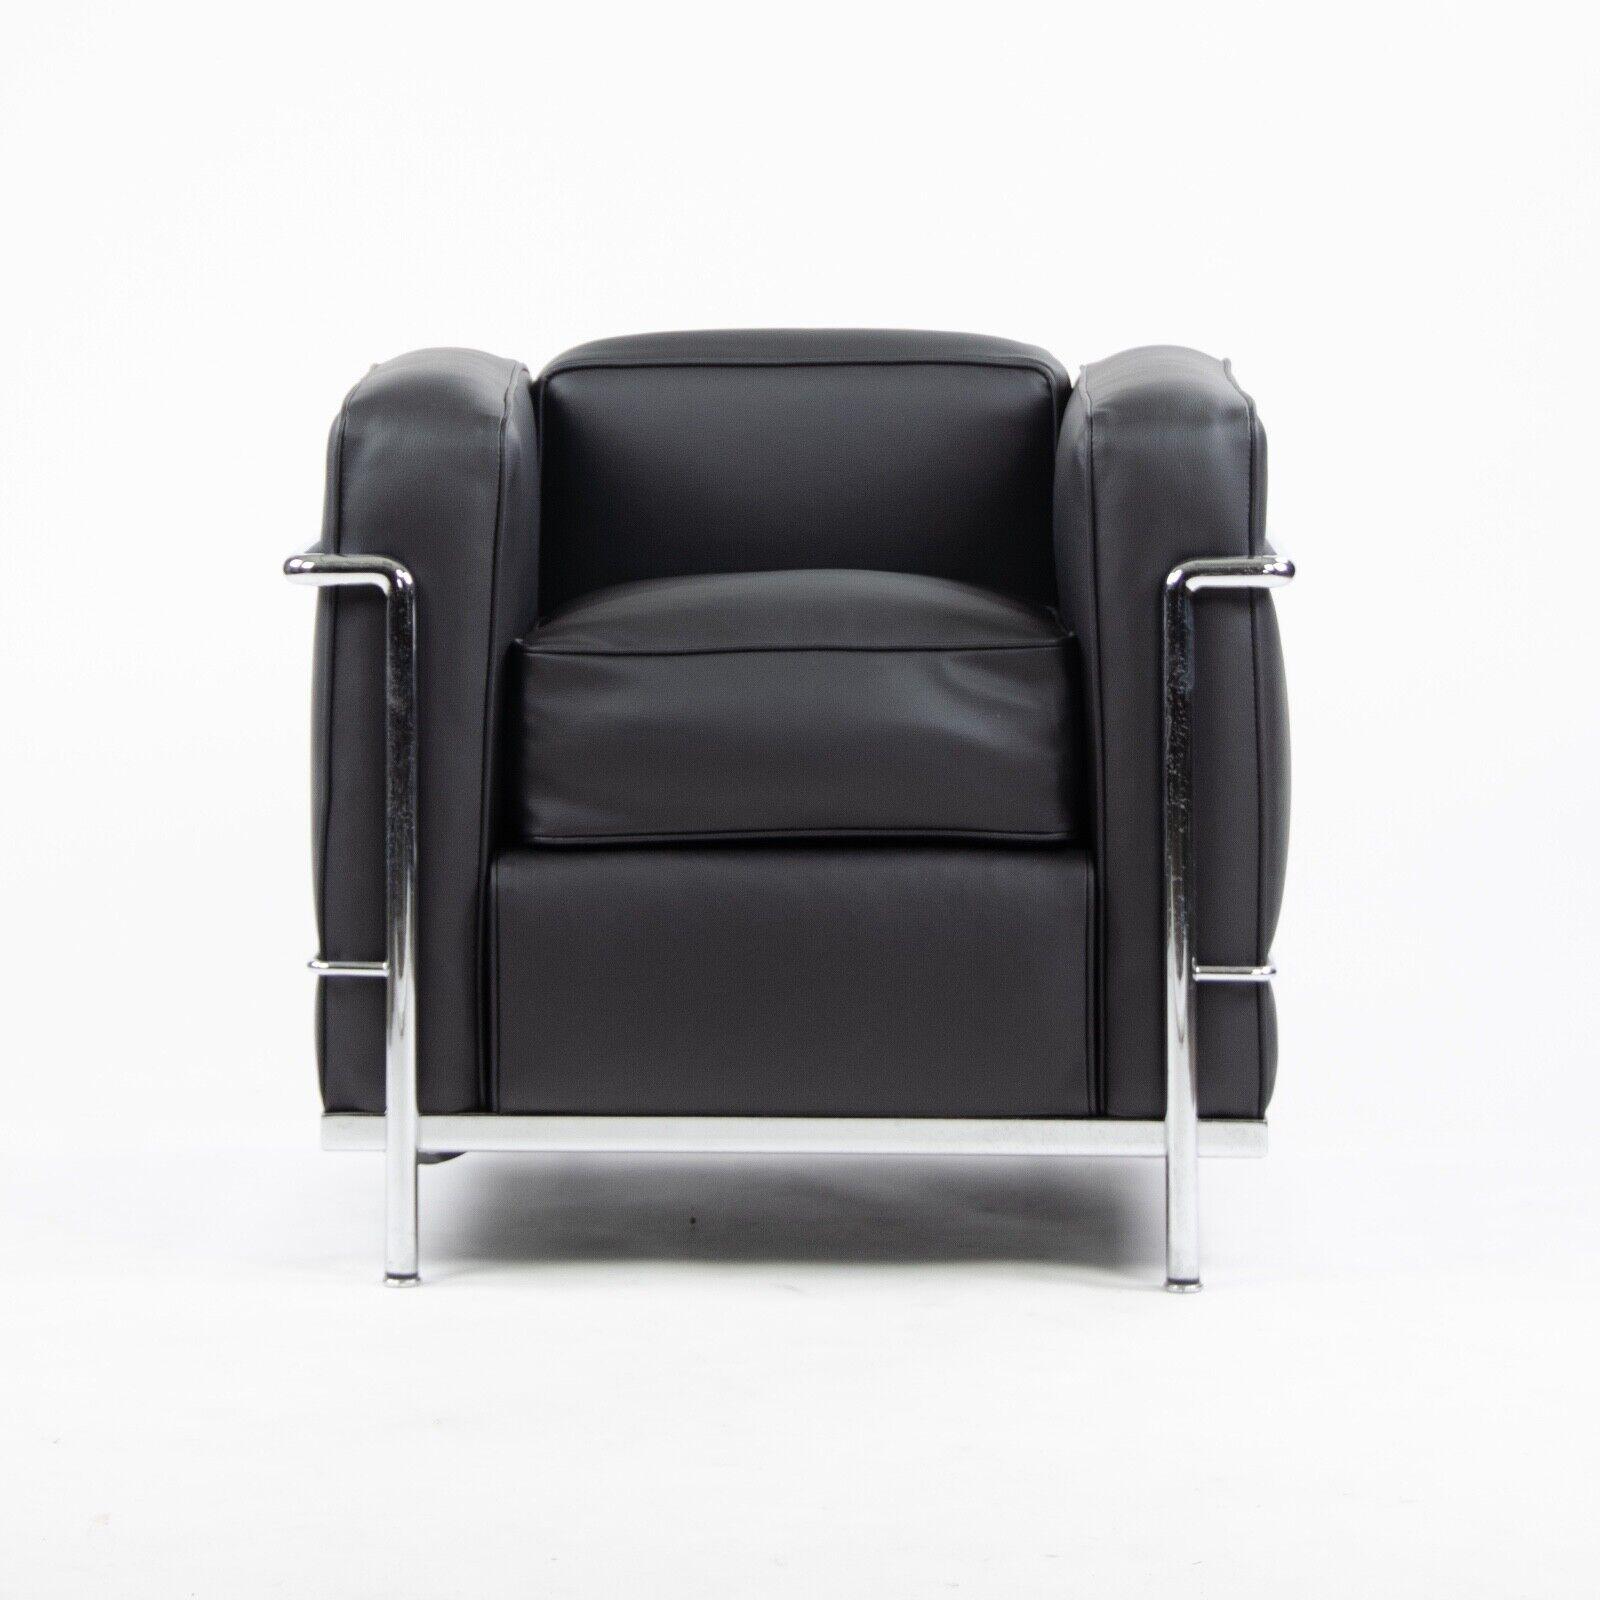 Details zu Cassina Italien Le Corbusier LC2 Petit Modele Sessel Neue  Polsterung